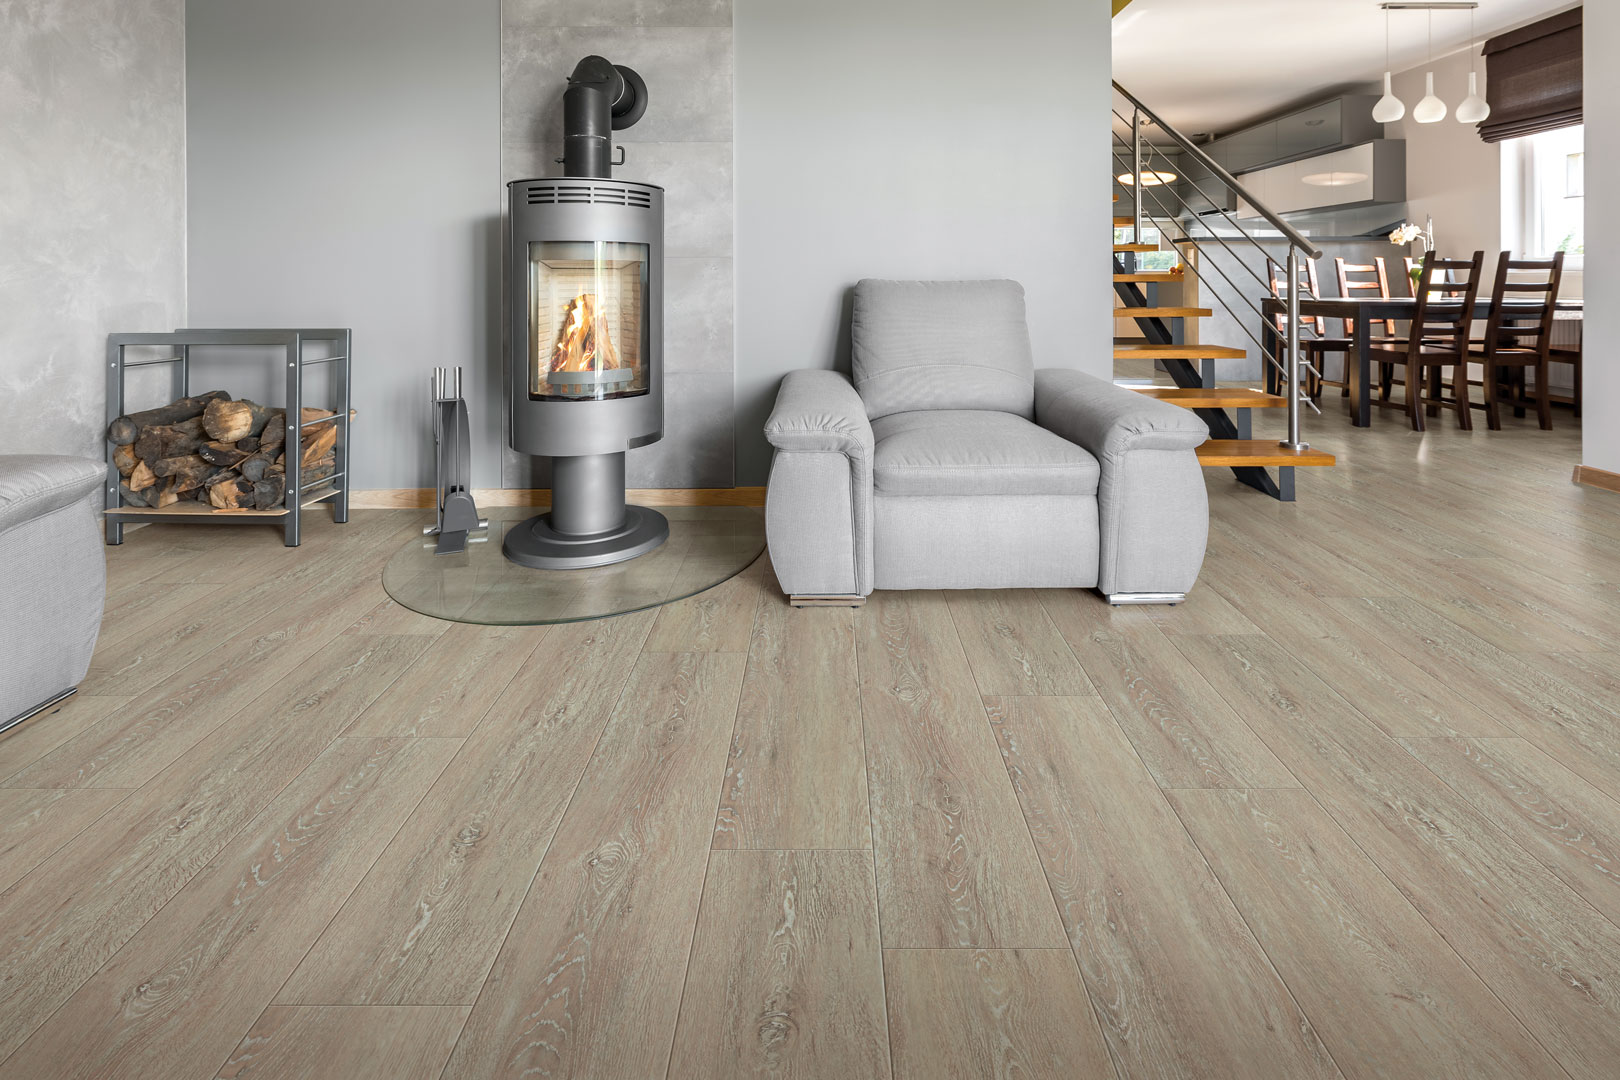 Vinyl Plank Flooring Coretec Plus Hd Xl Pro Plus Vinyl